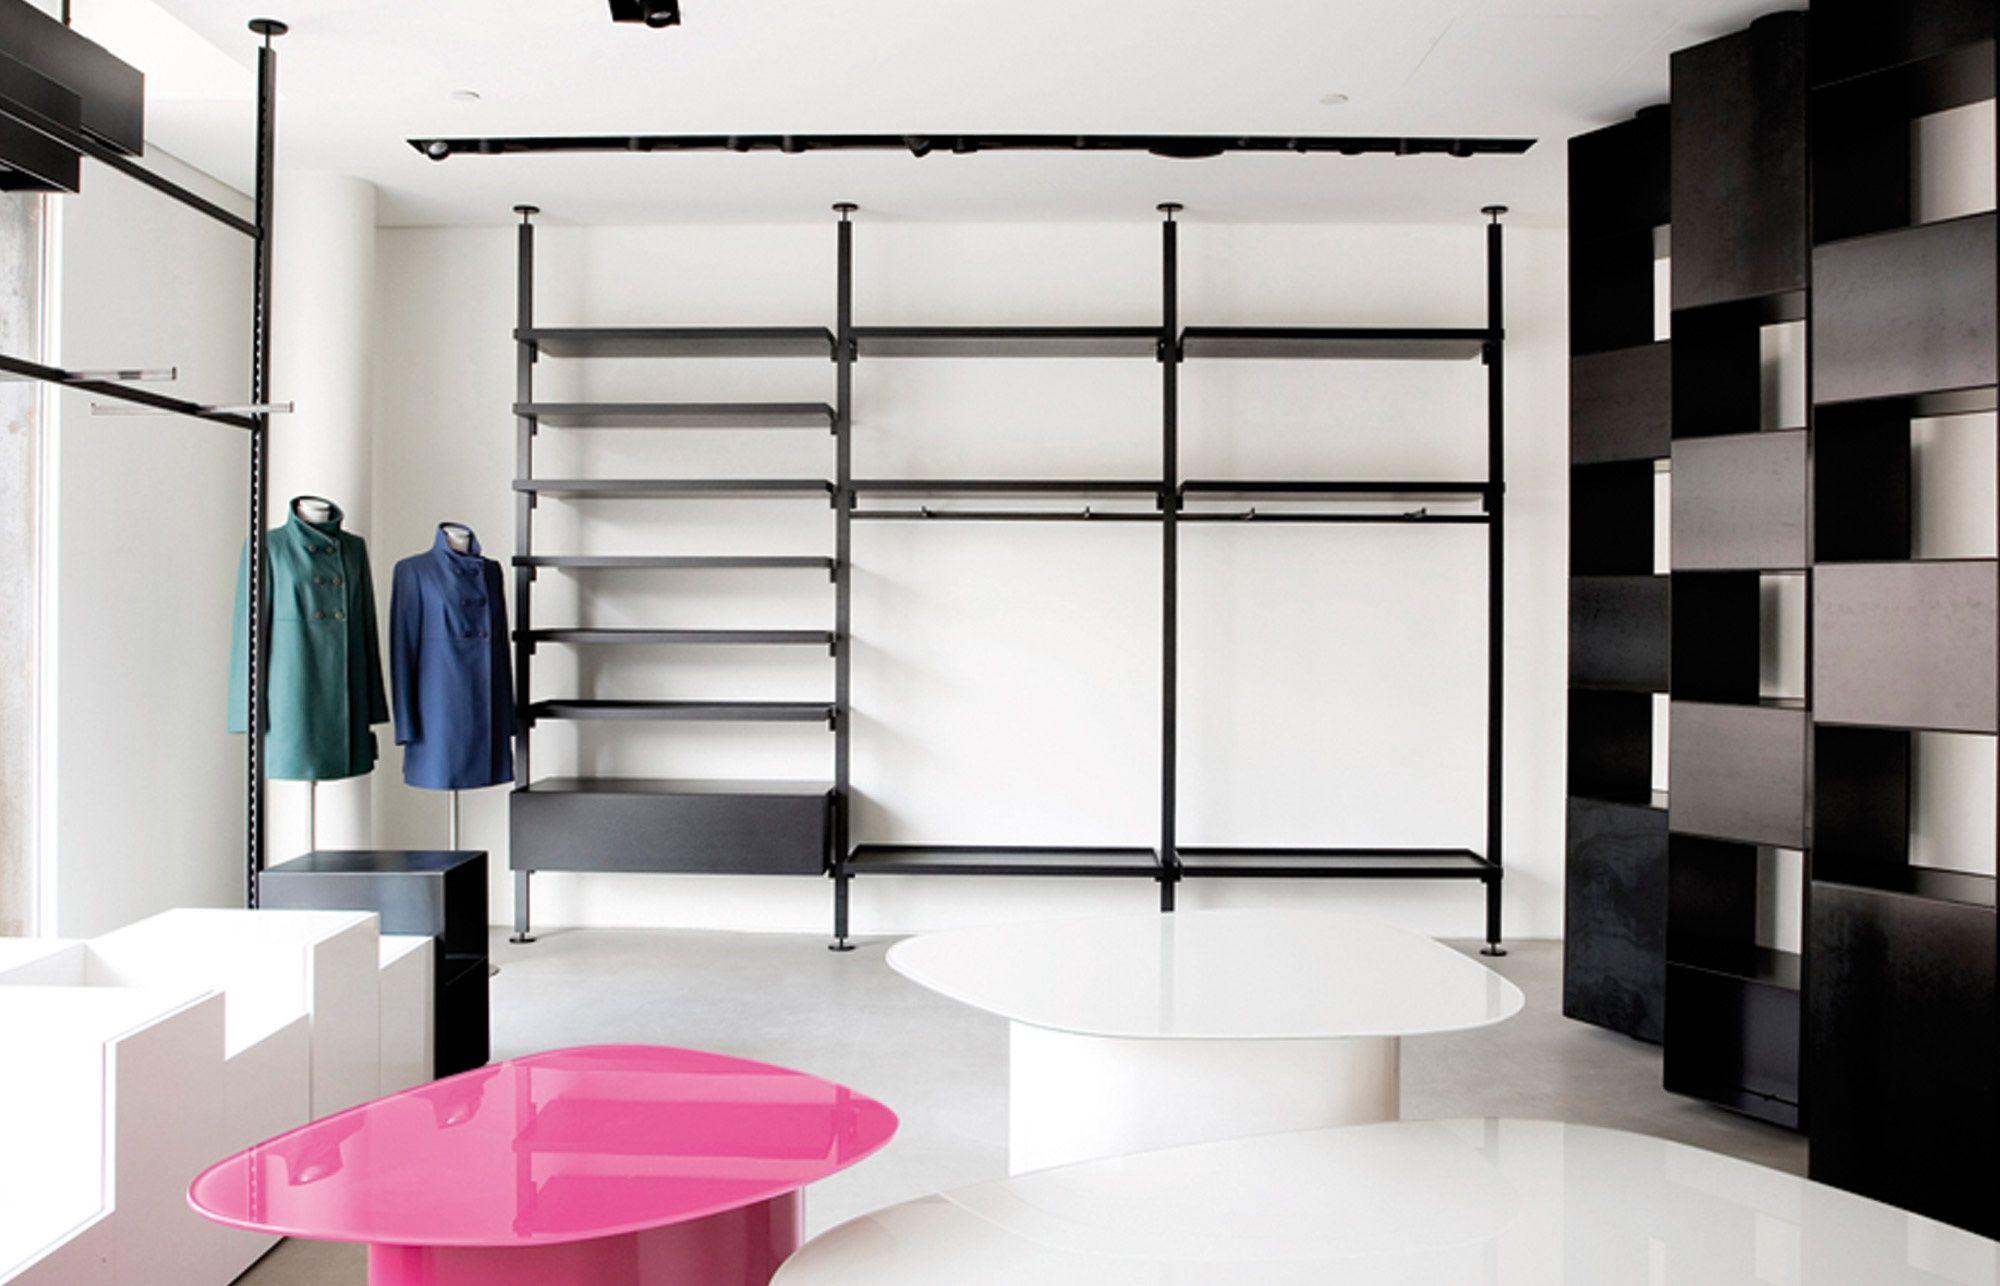 Benetton Concept Store, Istanbul Piero Lissoni Ph L Jucker